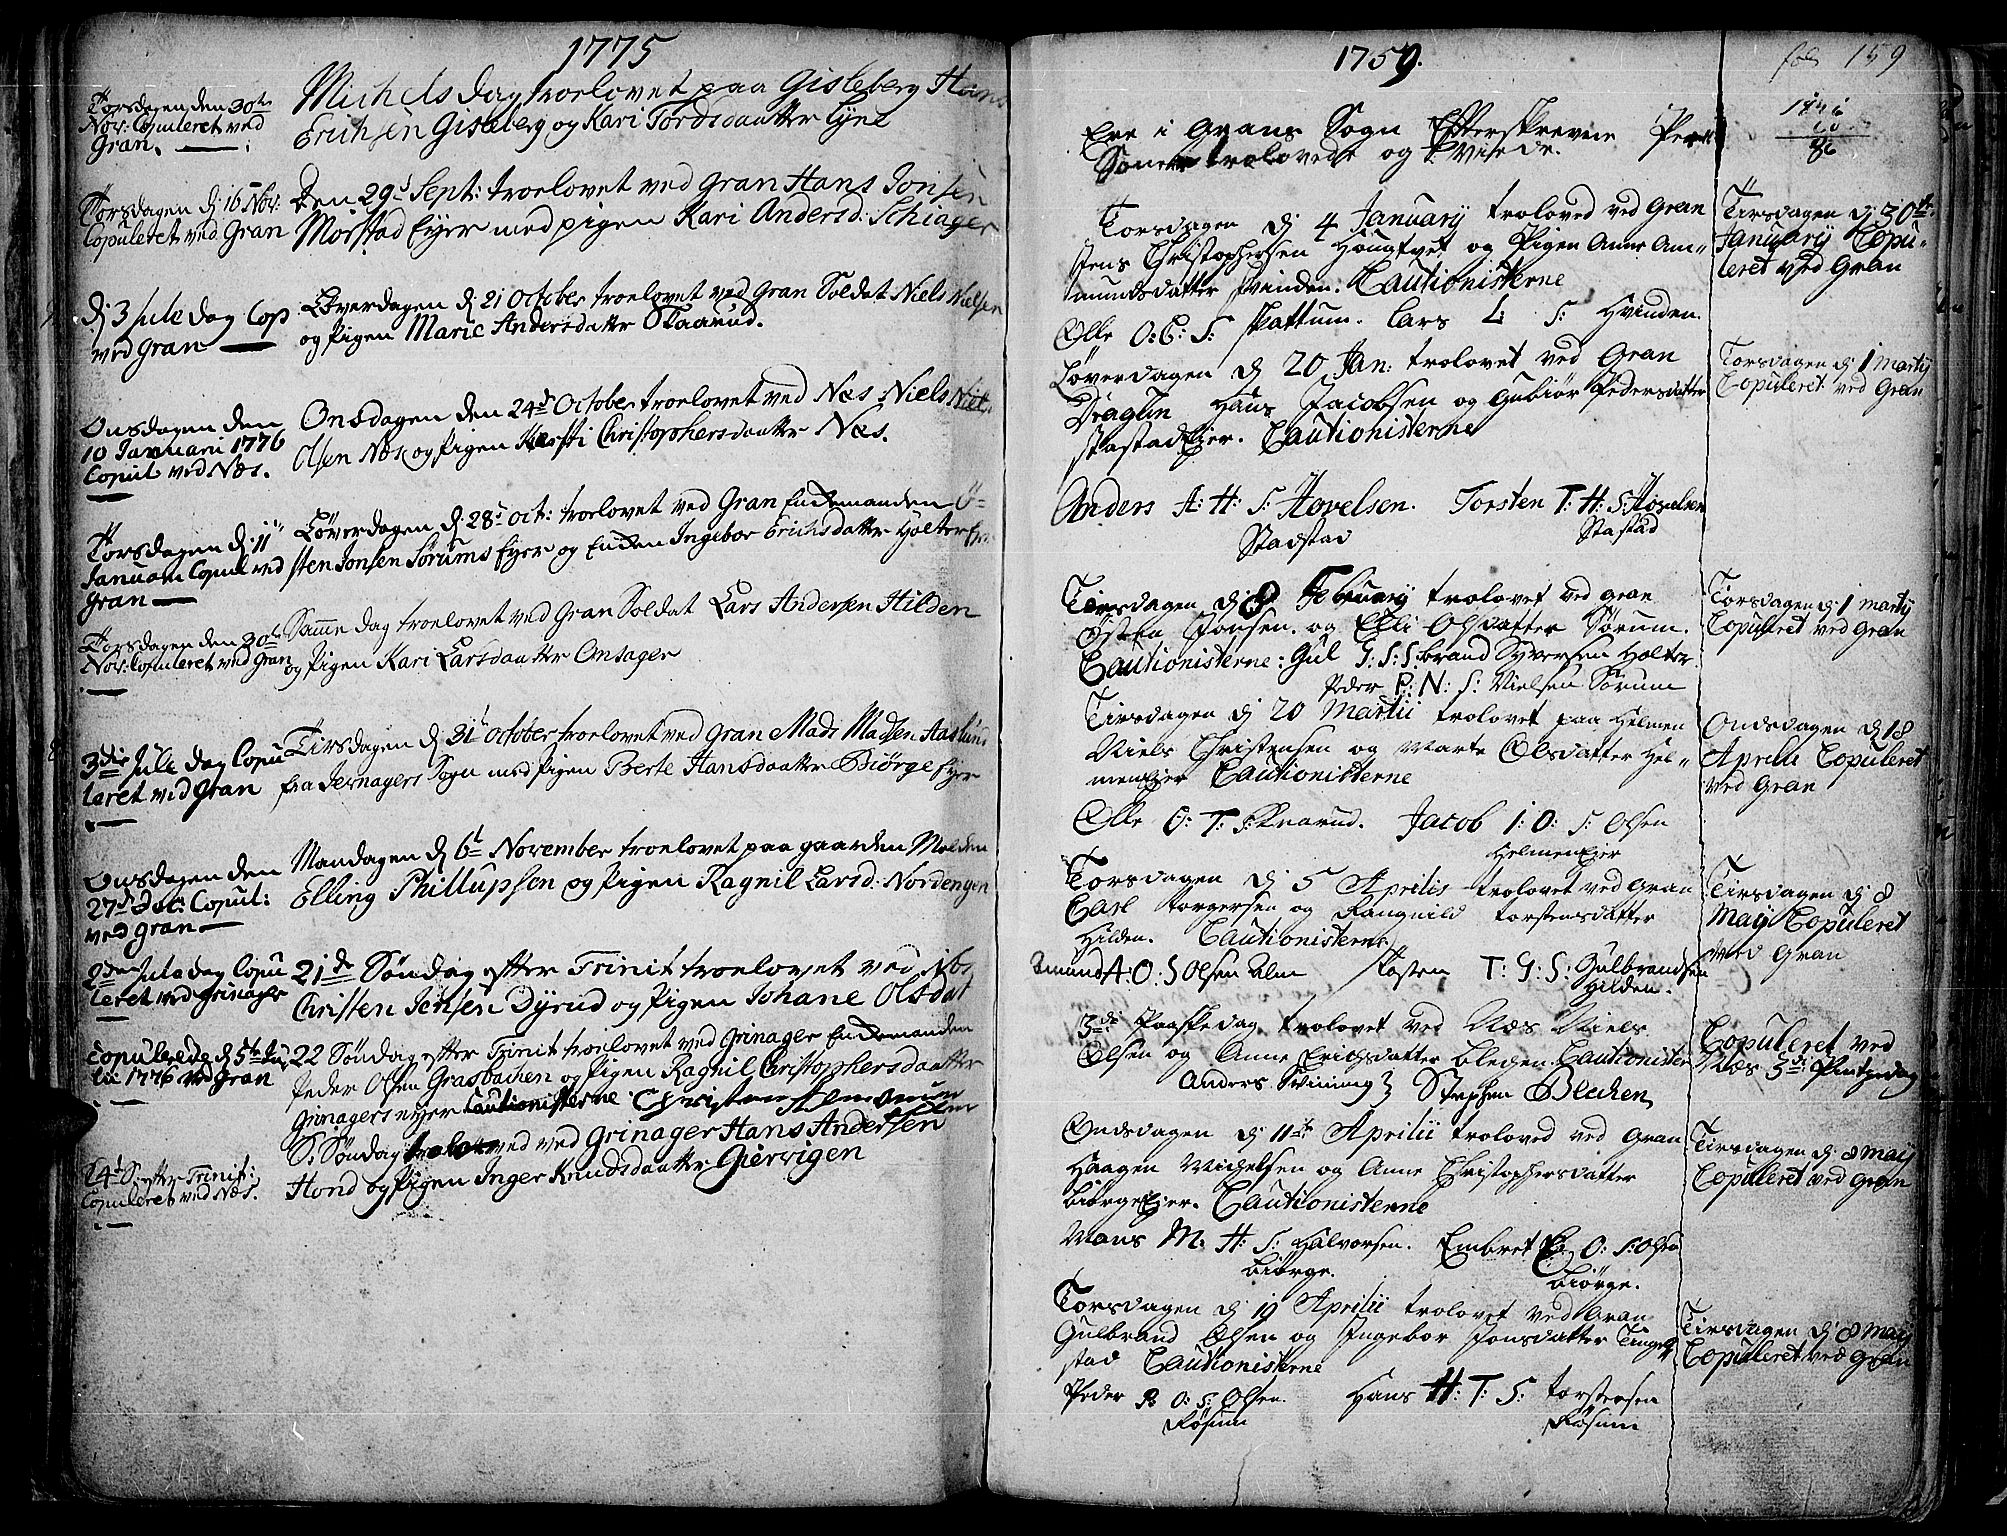 SAH, Gran prestekontor, Ministerialbok nr. 4, 1759-1775, s. 159